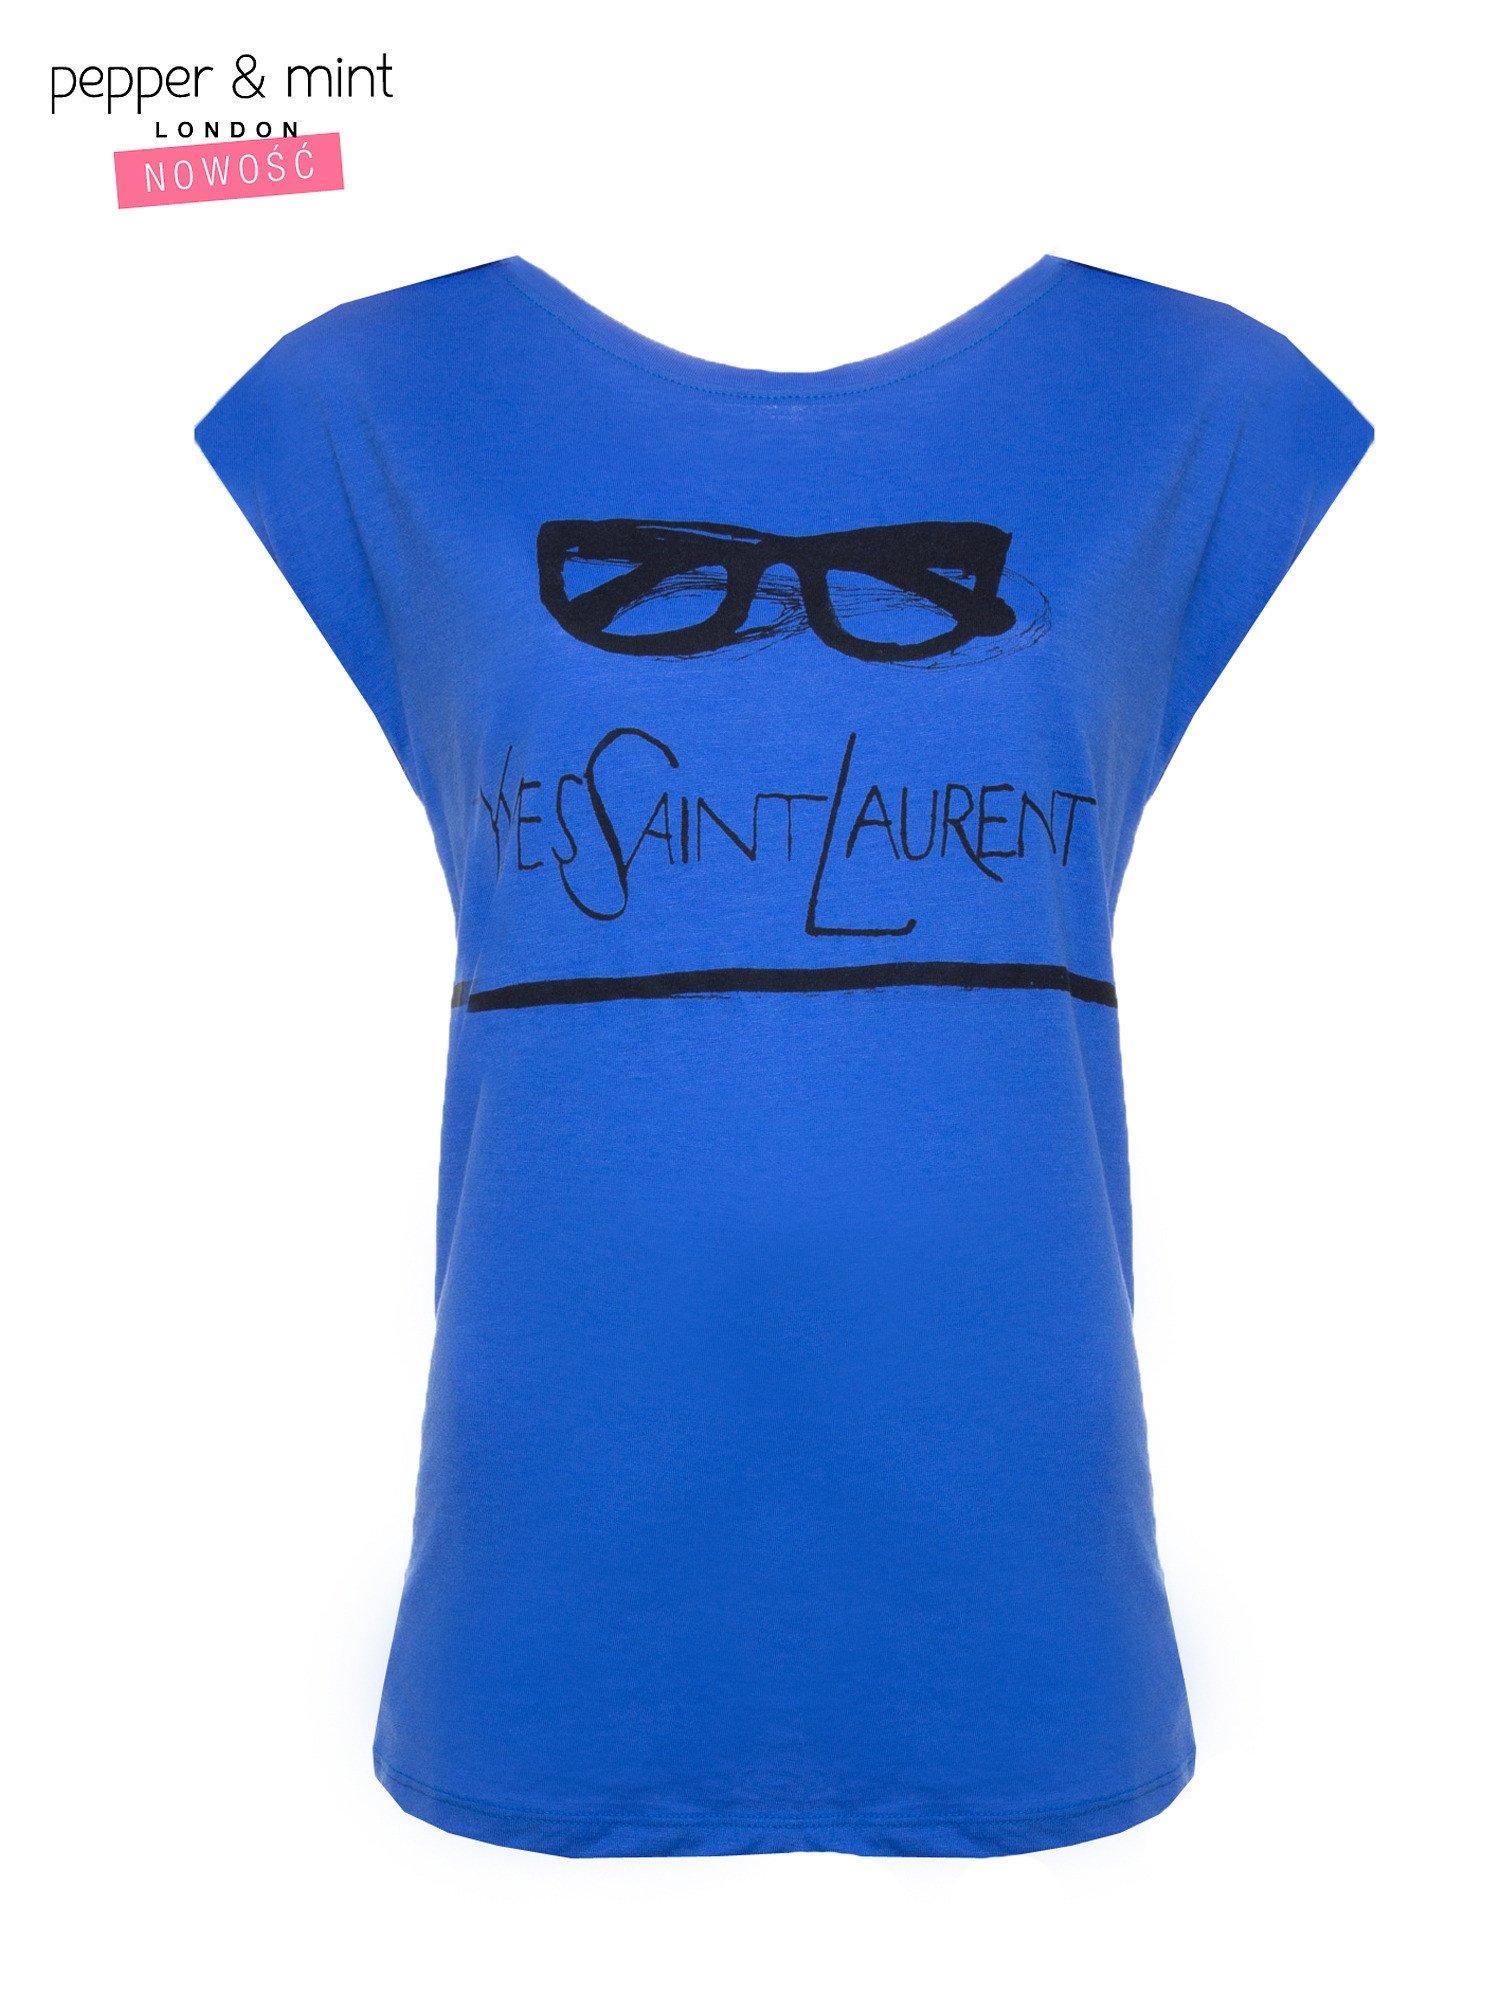 Niebieski t-shirt z nadrukiem YVES SAINT LAURENT                                  zdj.                                  1